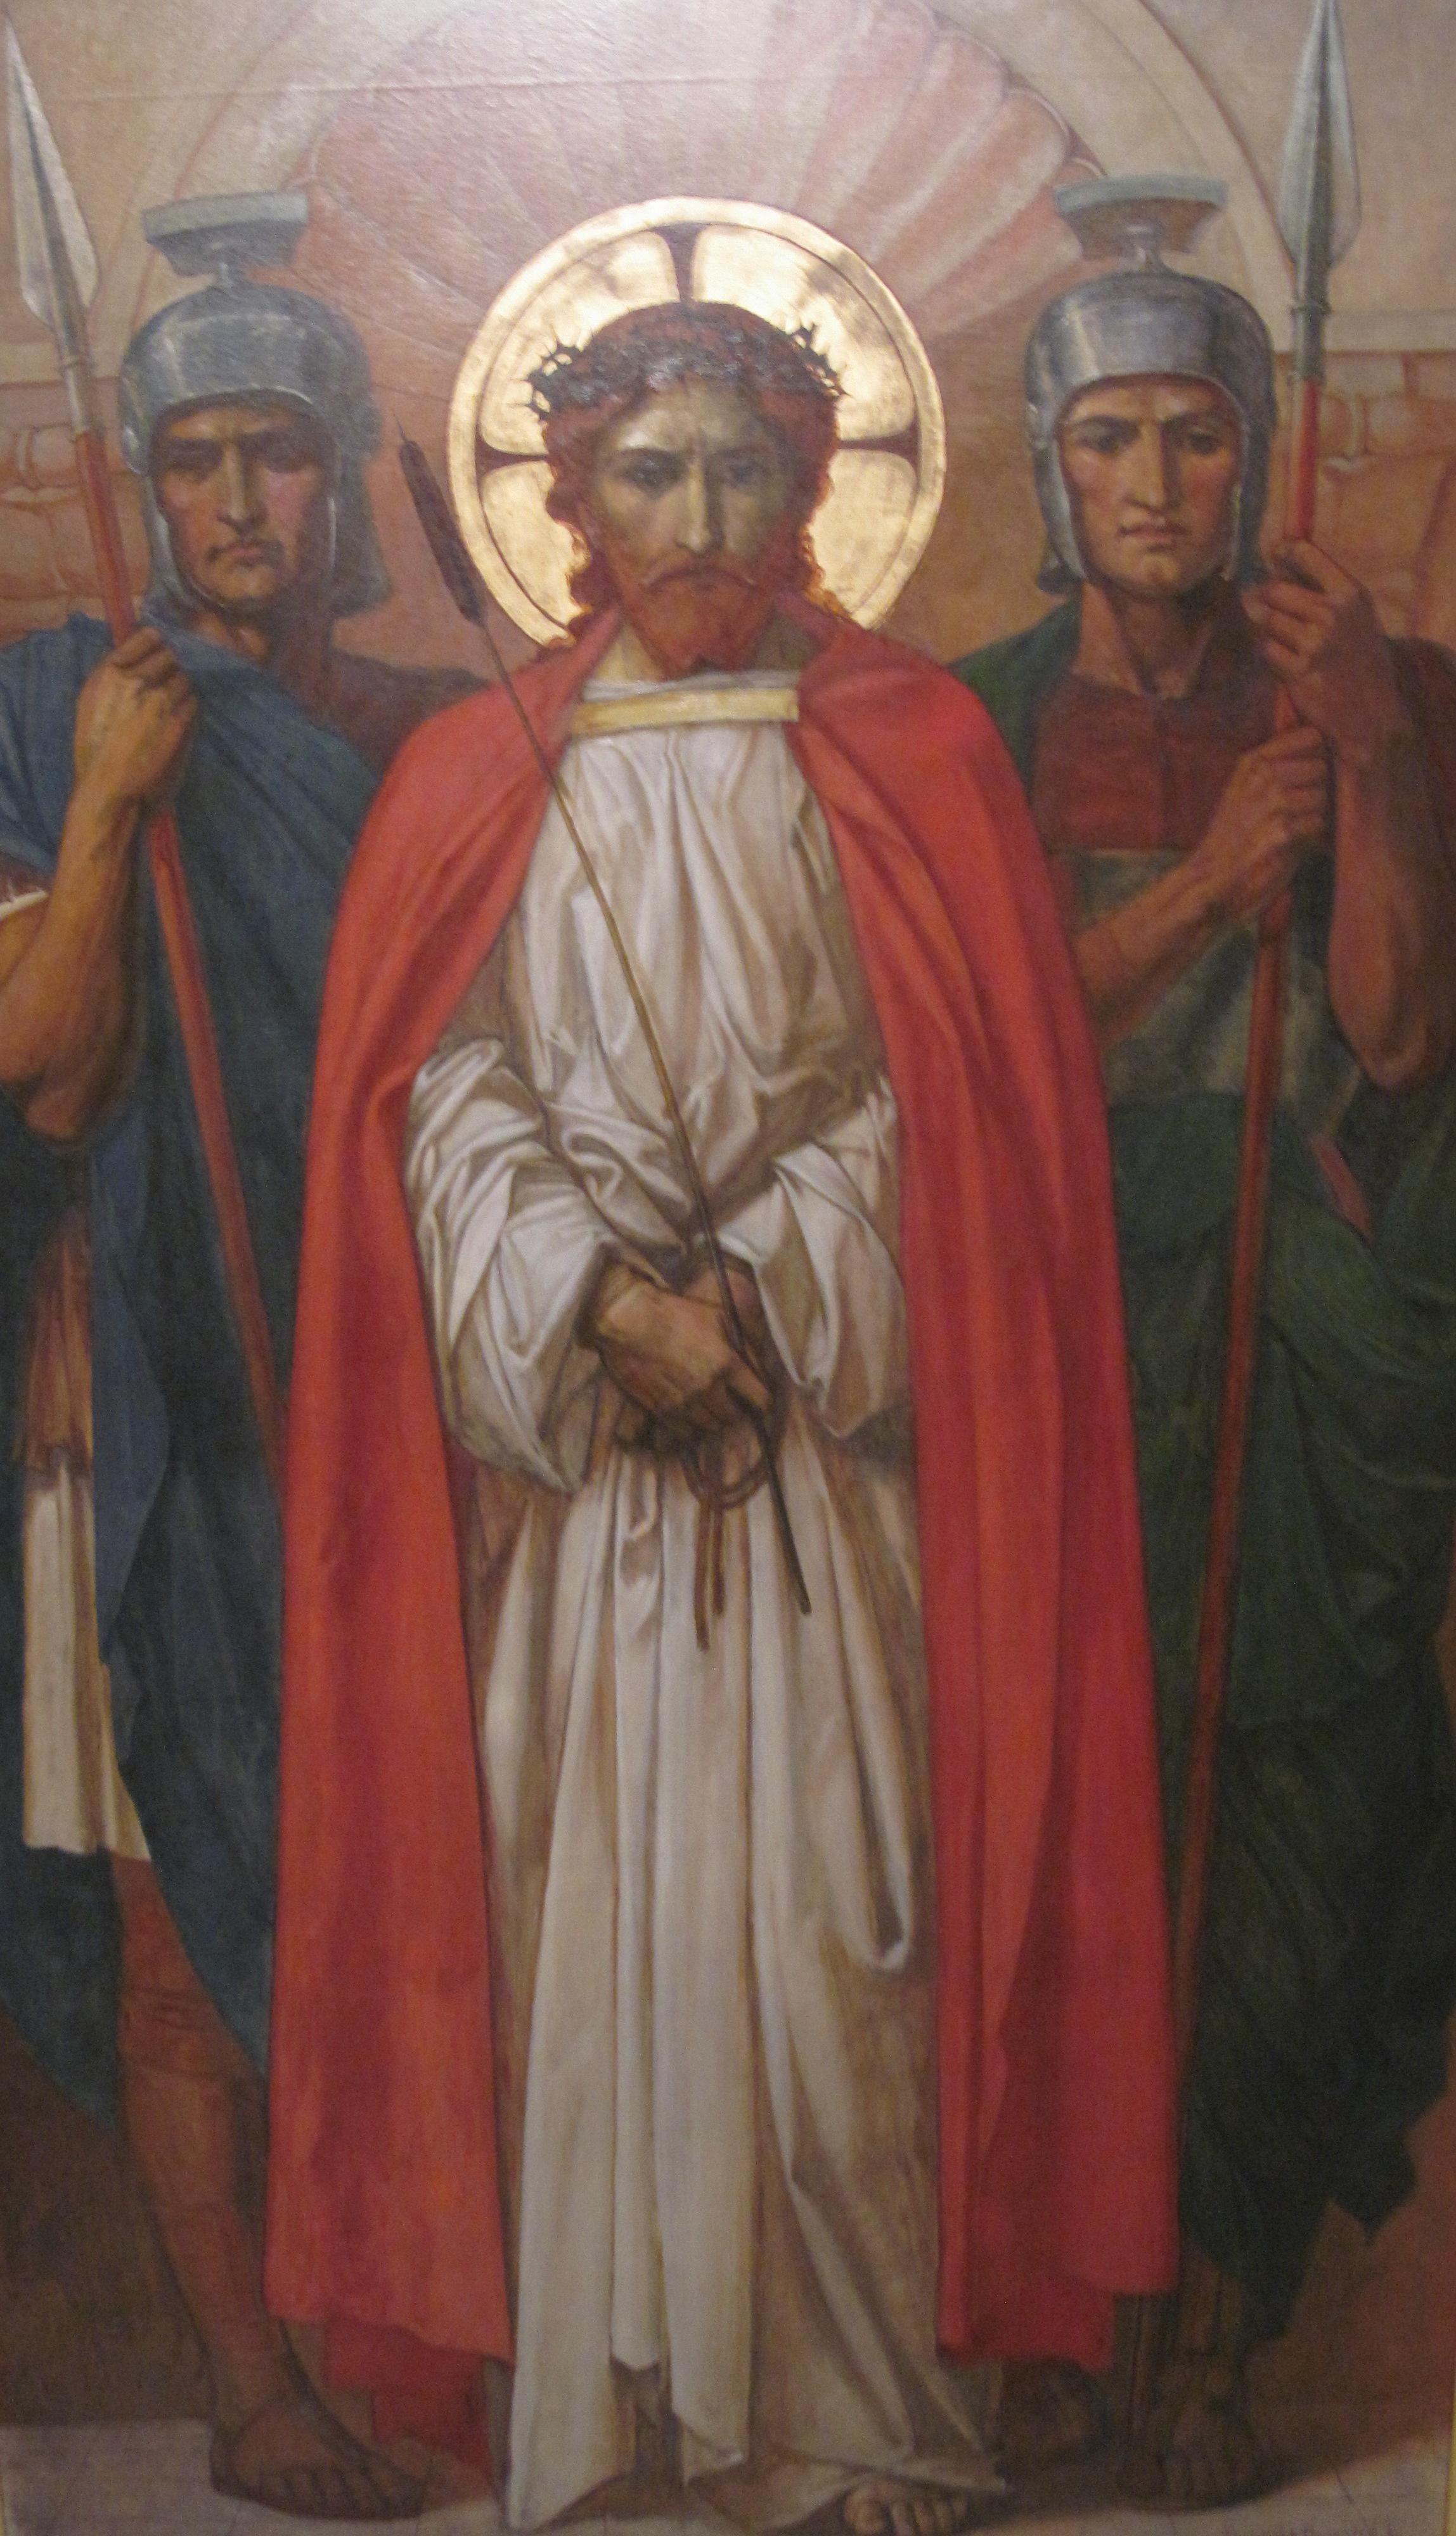 Henry_Thomas_Bosdet_painting_of_Jesus_before_his_crucifixion_3.jpg